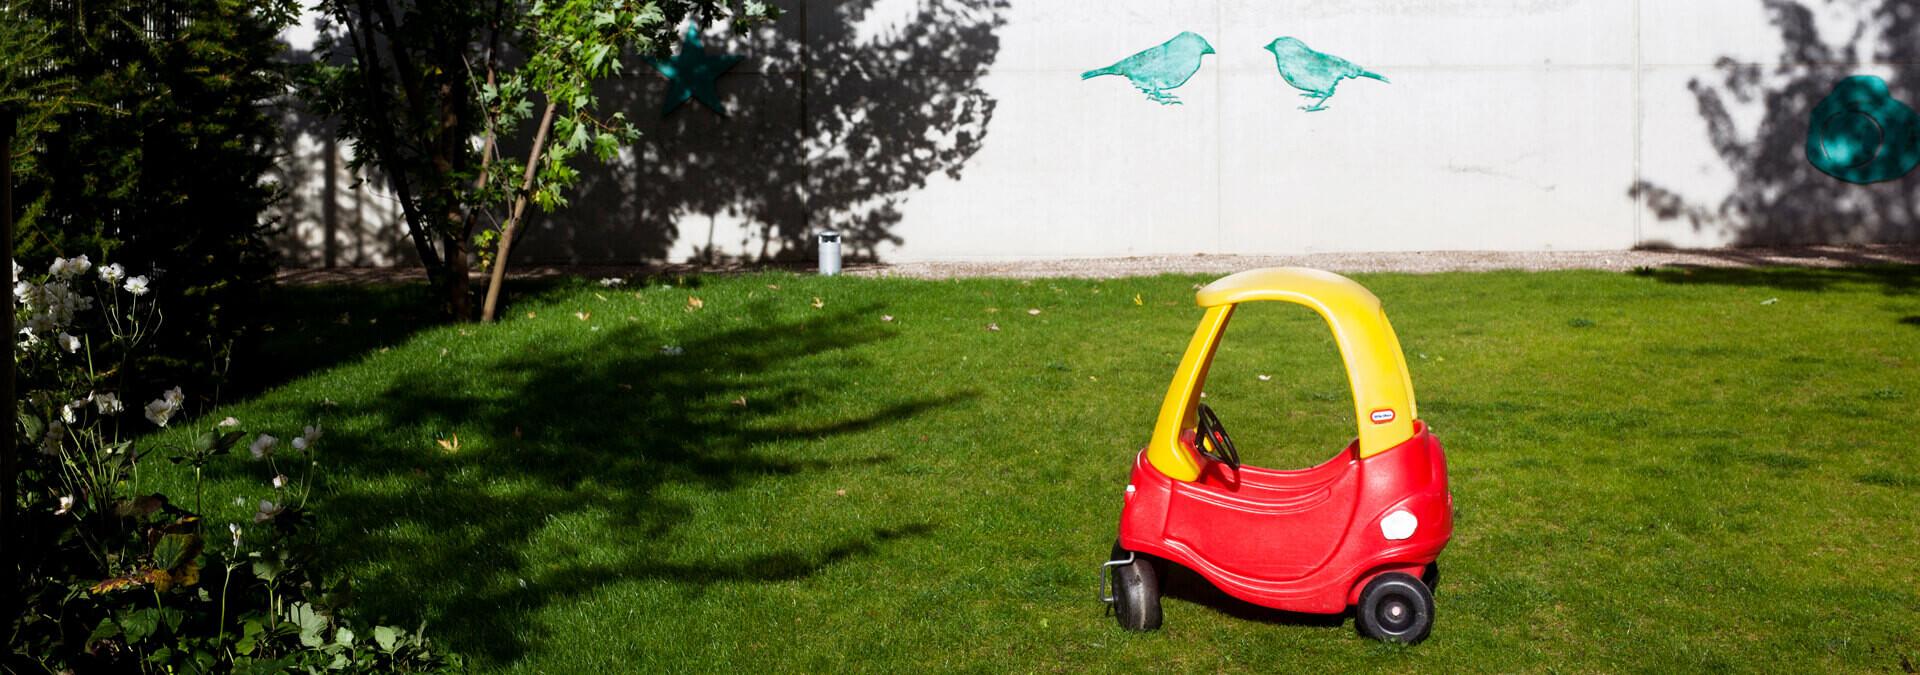 Have på krisecenter med træer og gul og rød legebil